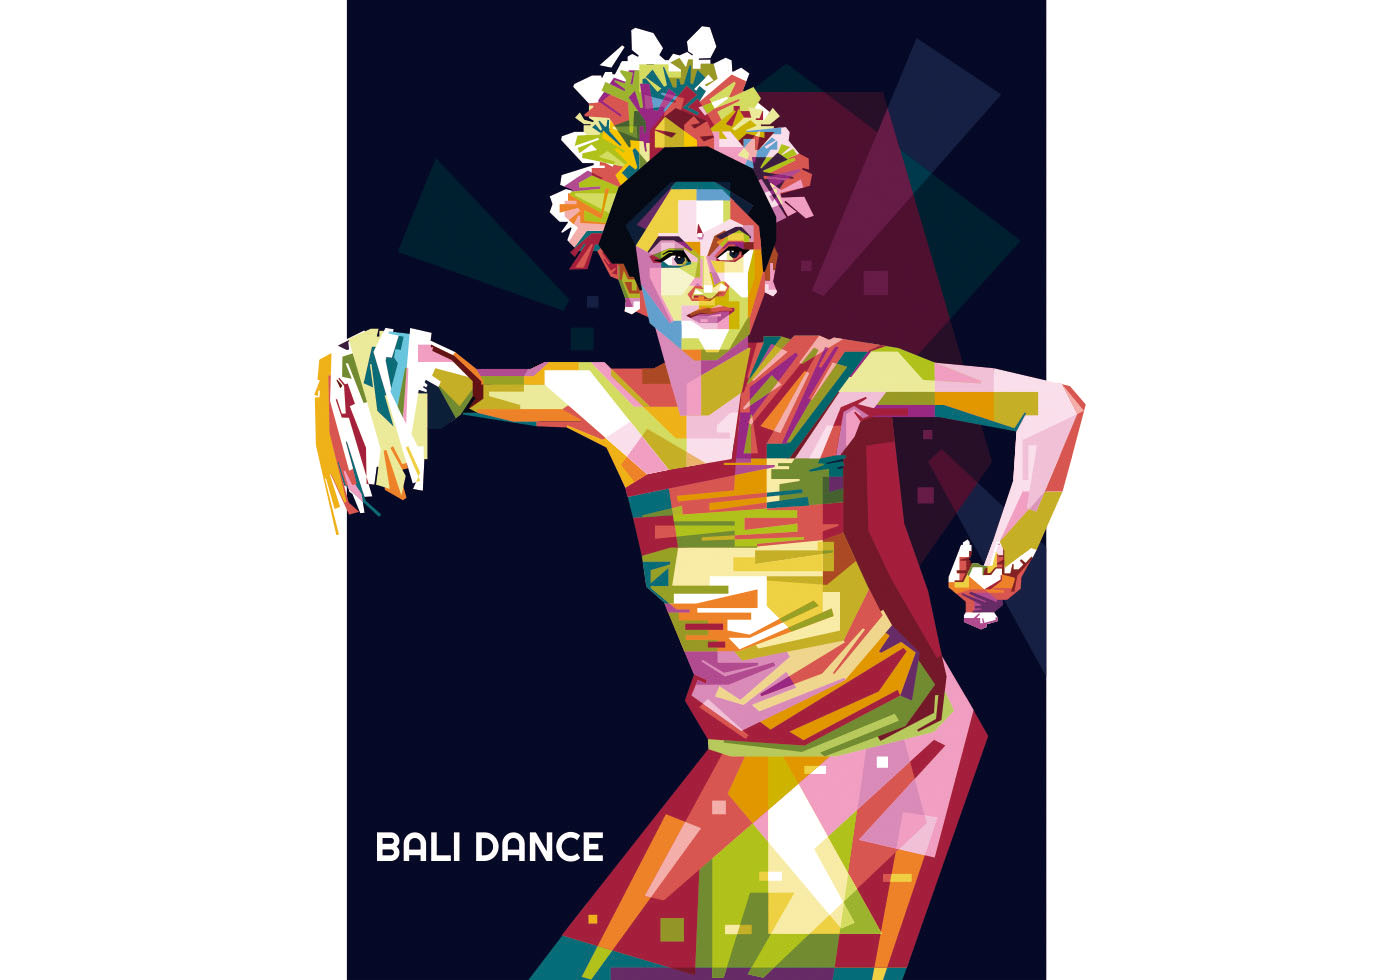 Bollywood dancer dances for us